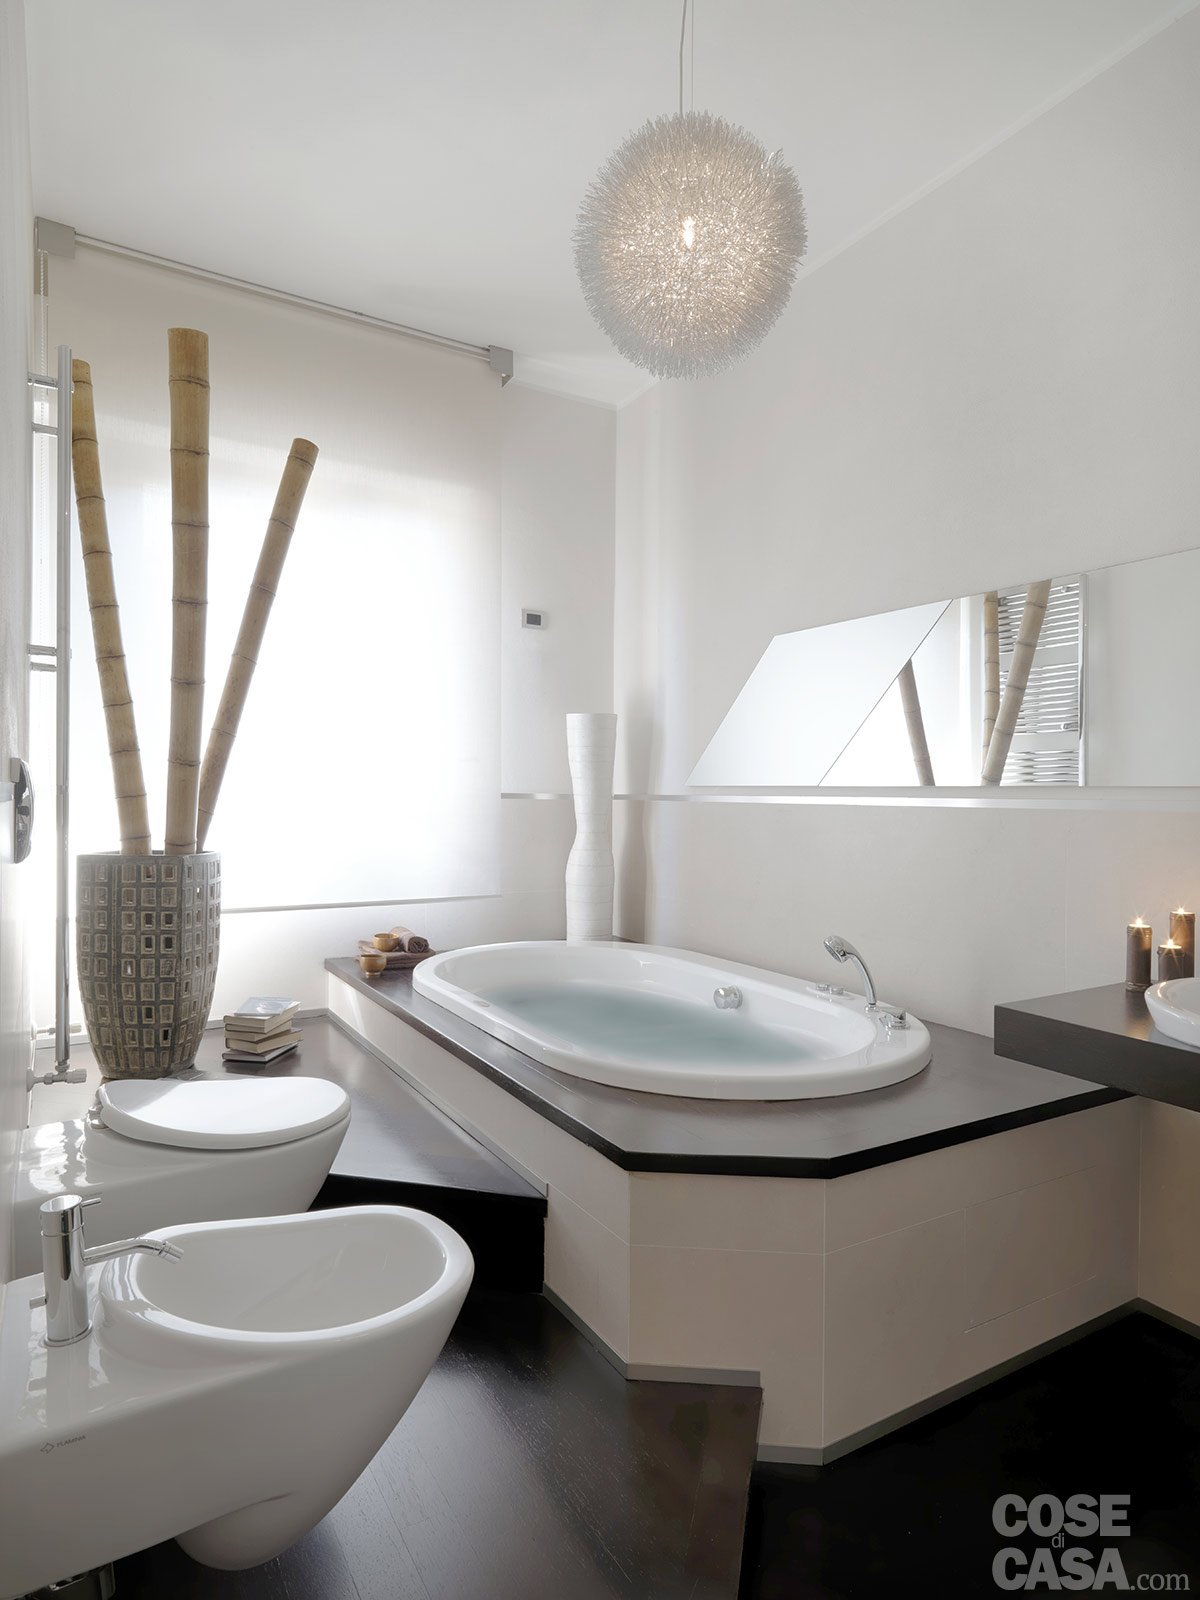 Una casa moderna su livelli sfalsati cose di casa - Casa e bagno ...